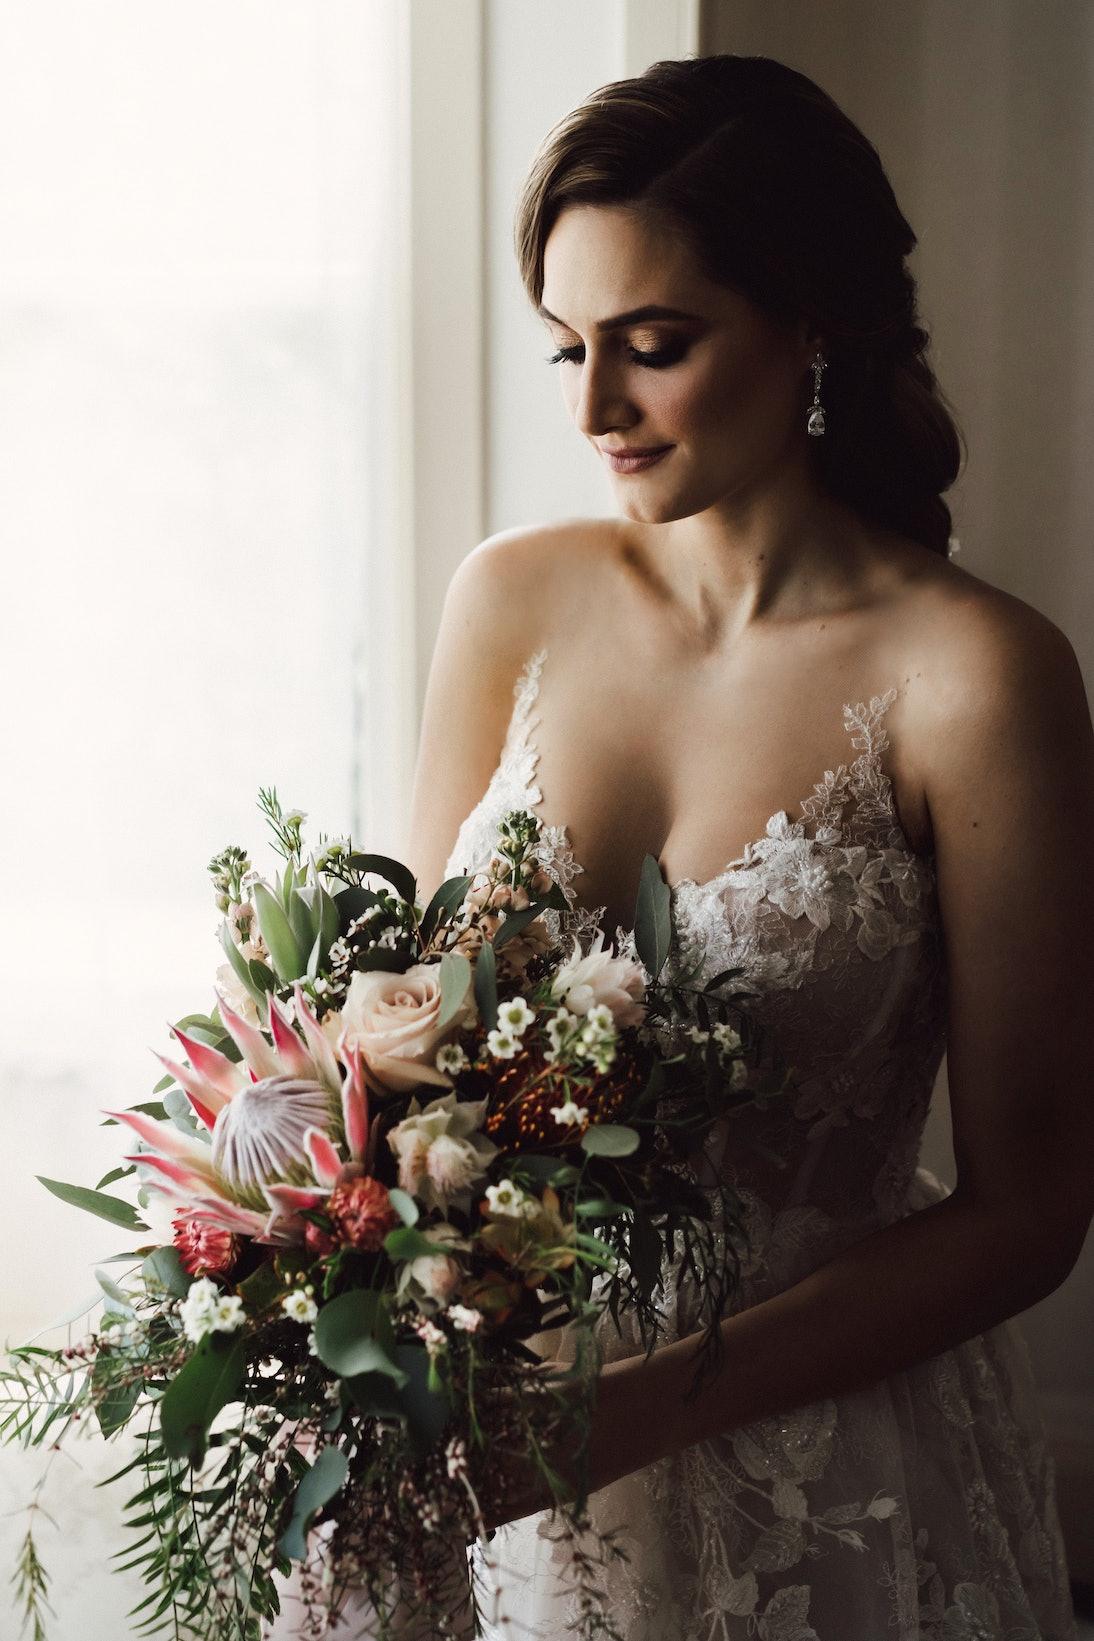 Bride holding bouquet in brides retreat